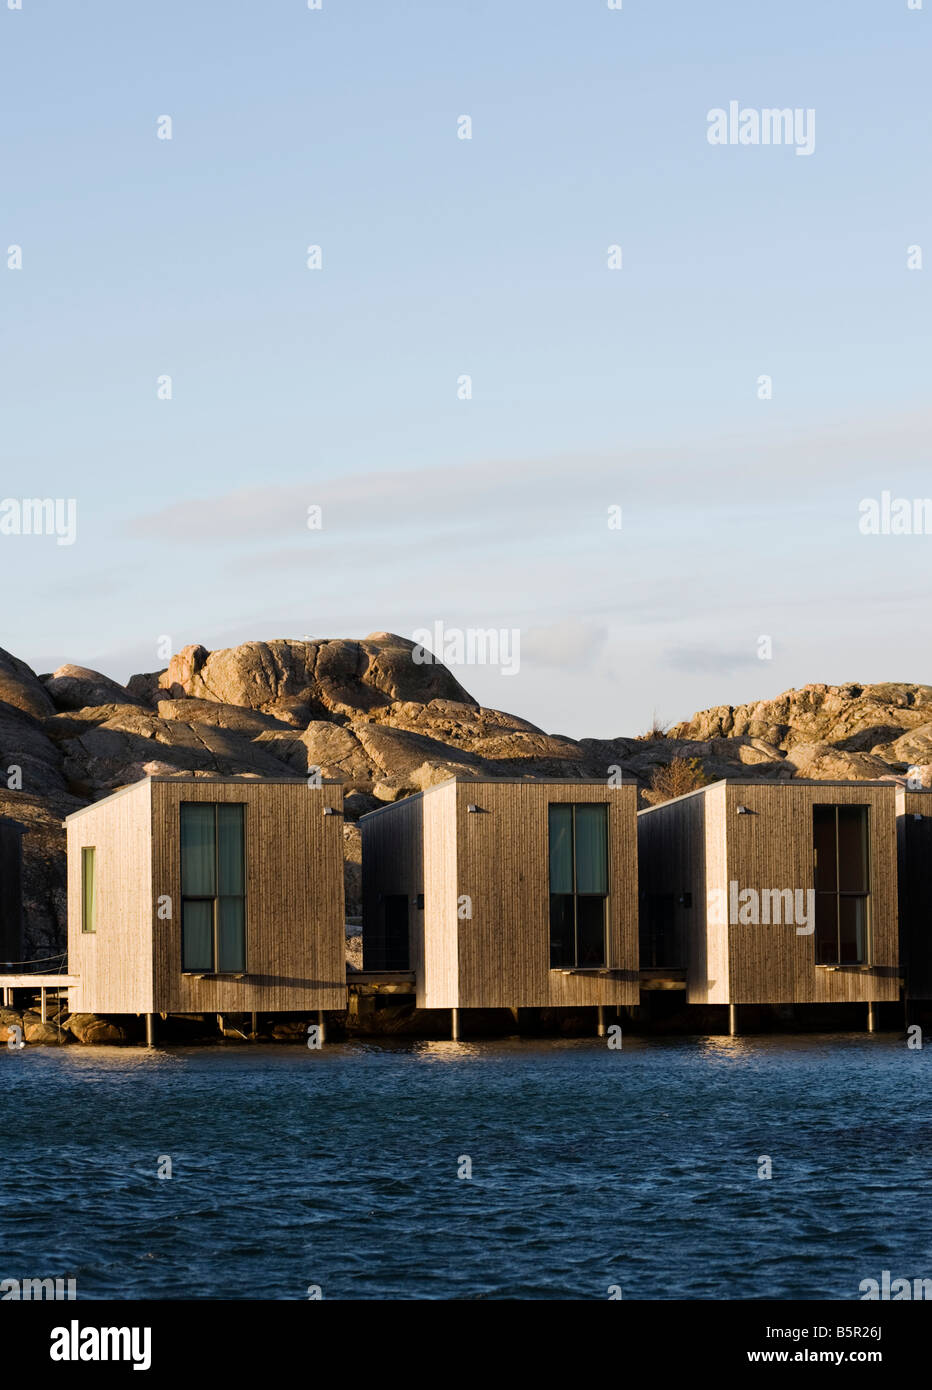 Modern Opposite Modern Wooden Vacation Huts Builtthe Sea Opposite The Nordic